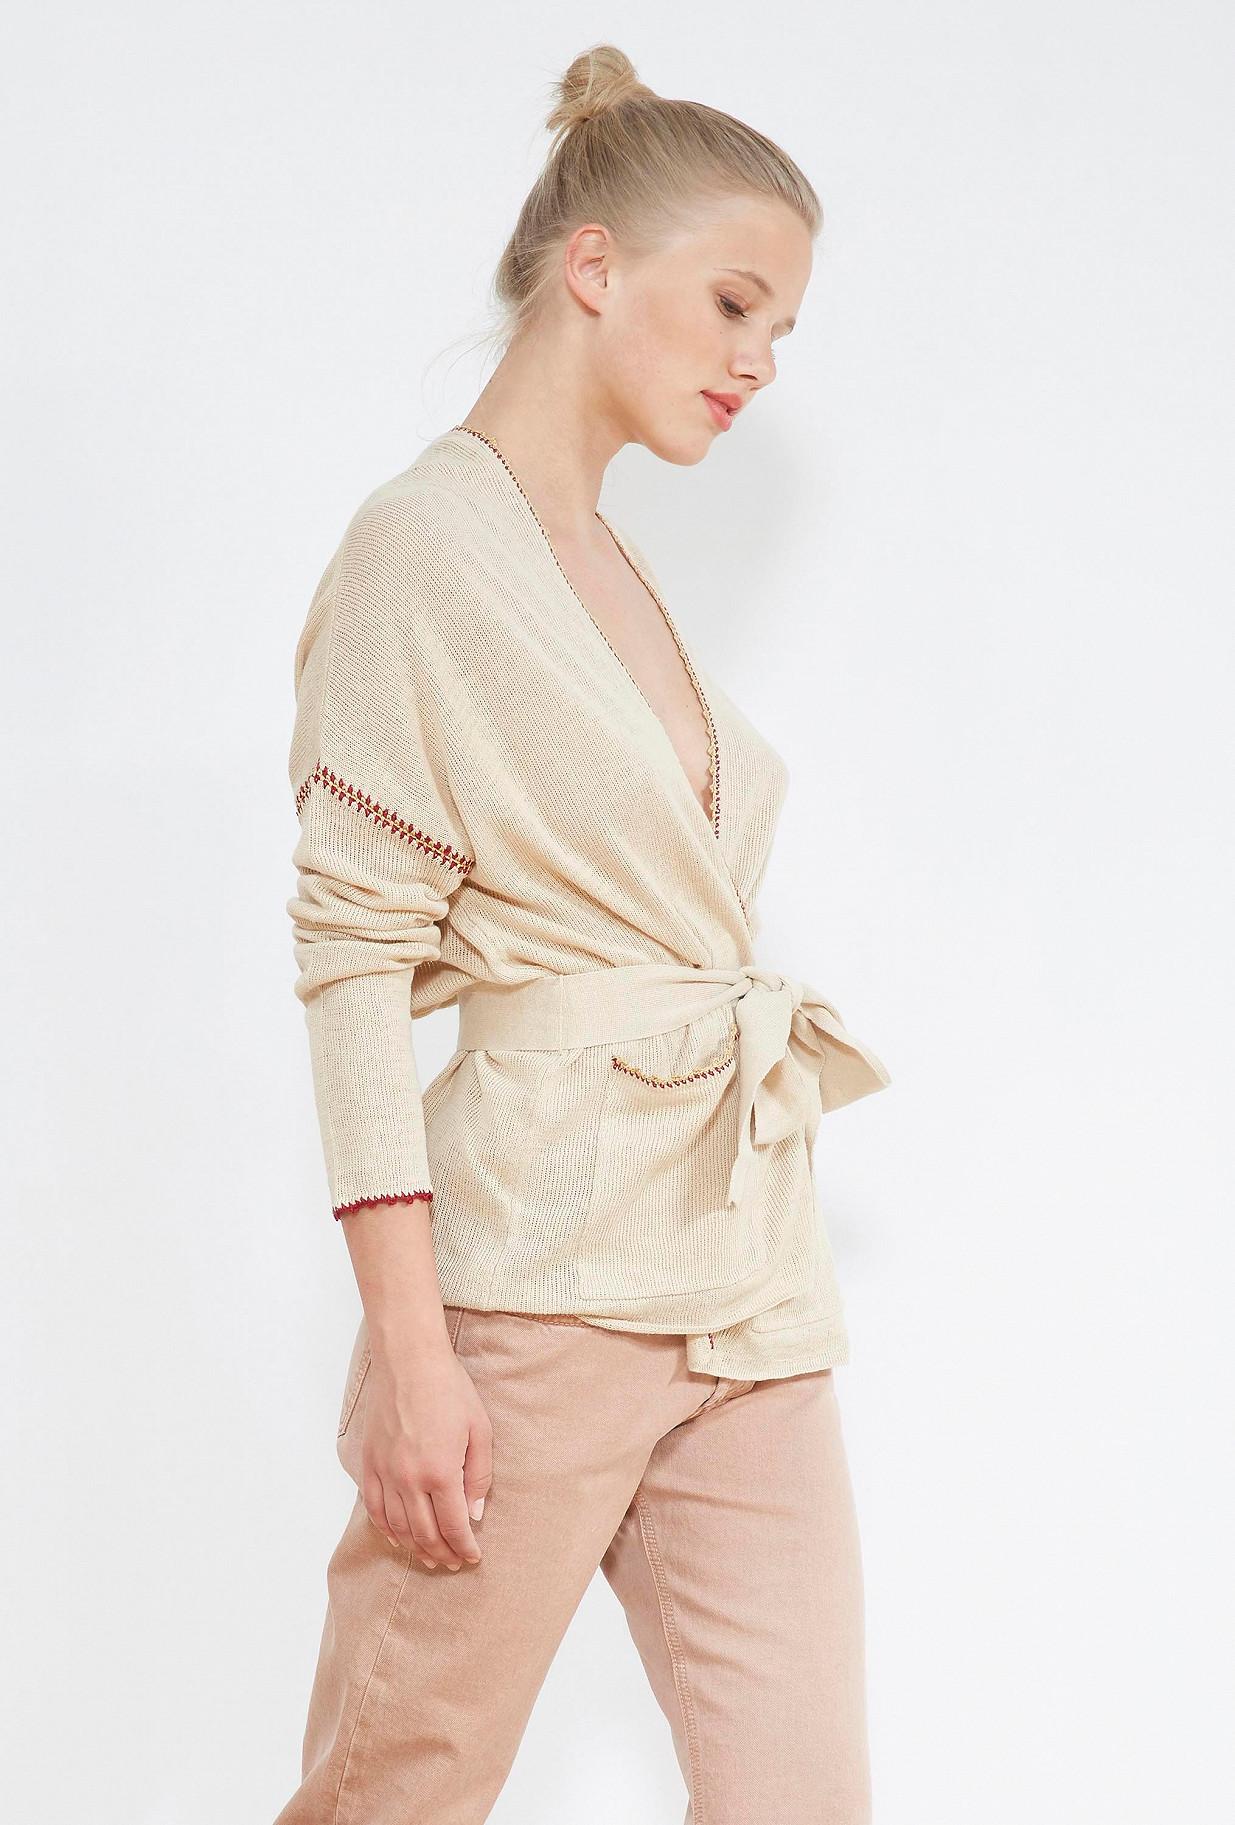 Boutique De Kimono Femme Tulum Mode Createur Paris